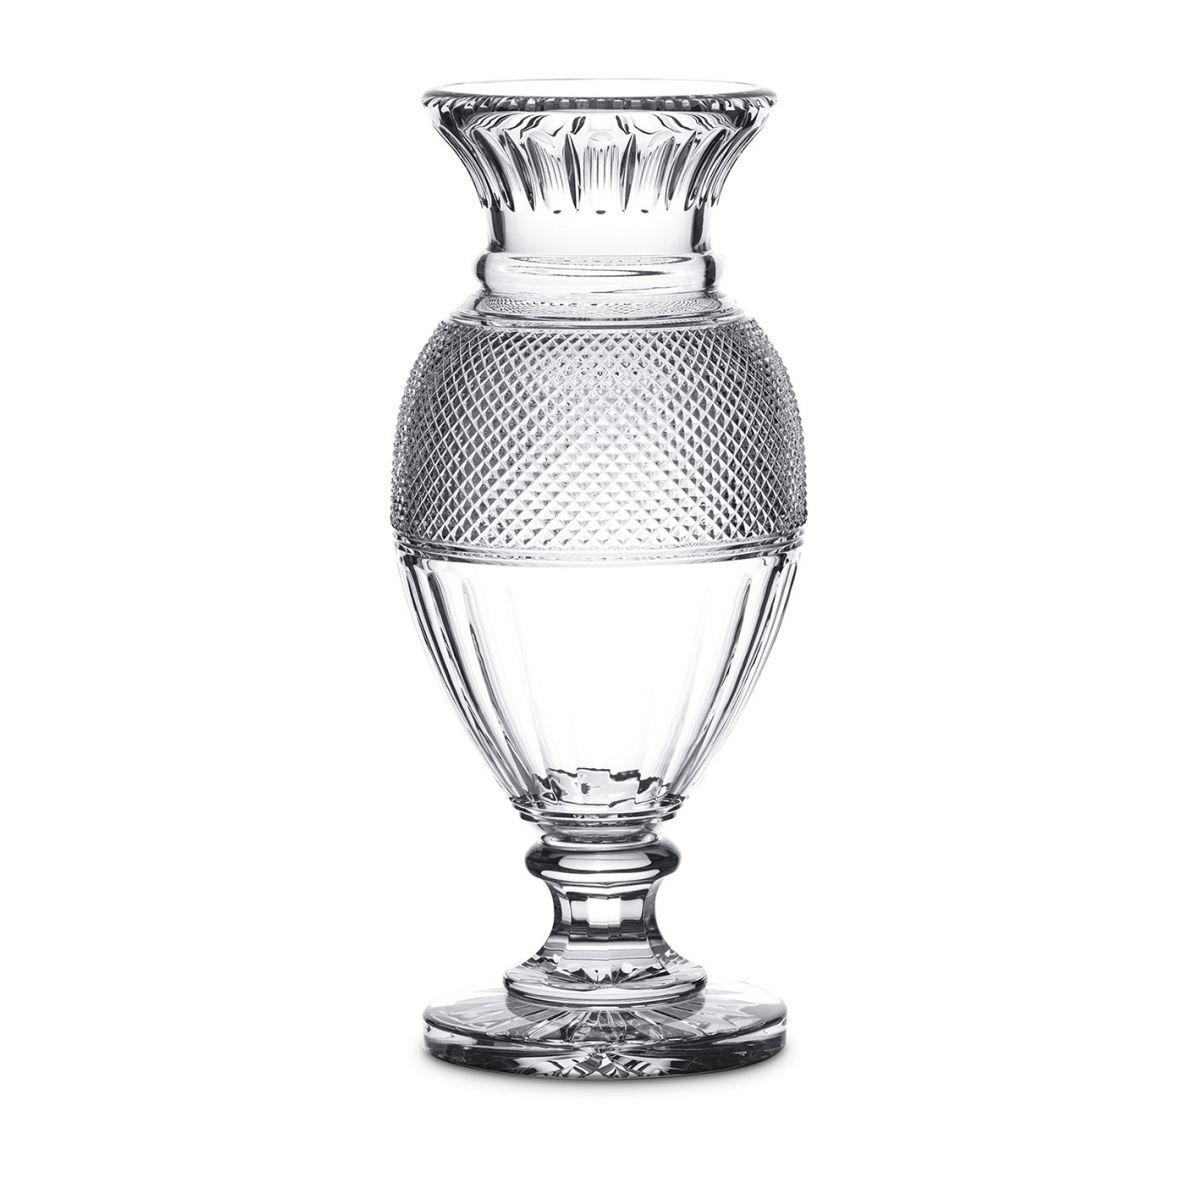 Vaso Balustre Diamant 50cm, Baccarat, 2807244